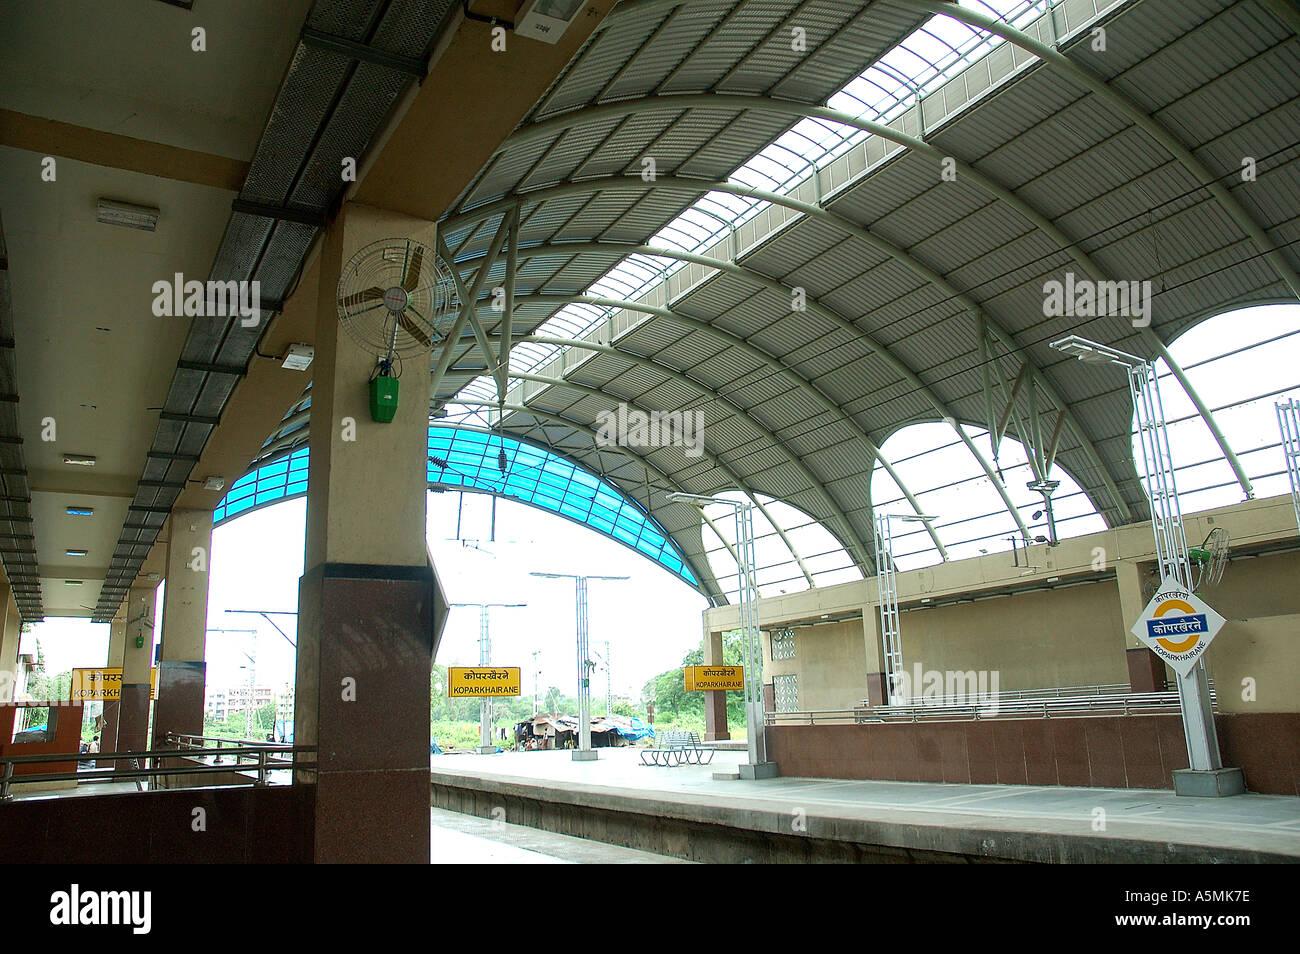 RAJ98892 Modern new Koper khairne Railway Station Navi Mumbai Vashi Bombay Maharashtra India Stock Foto